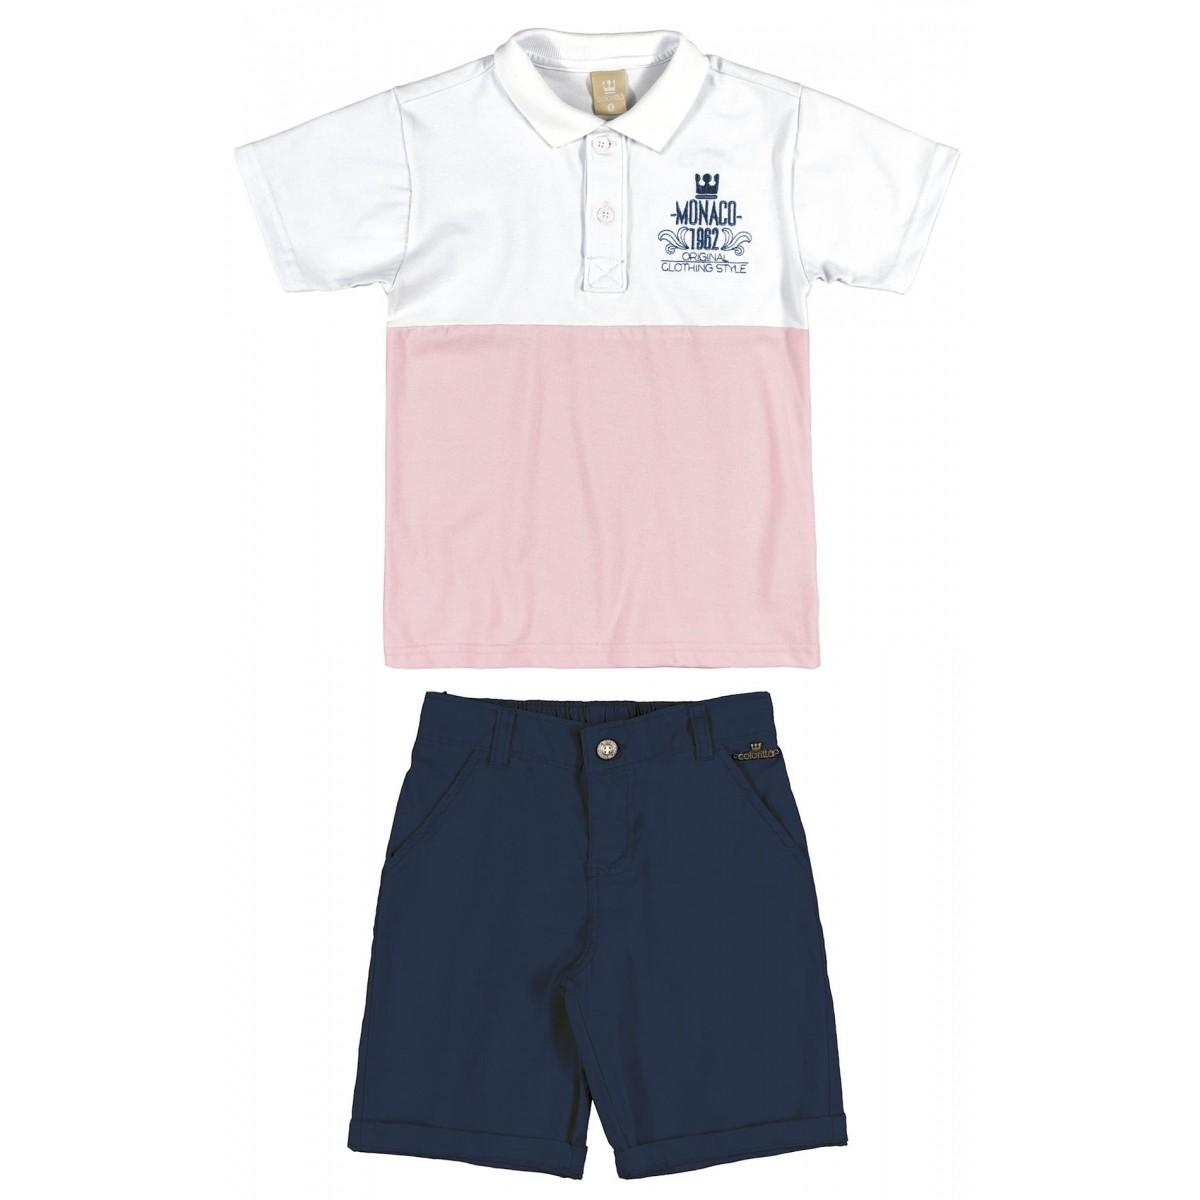 16967c7edc Conjunto Infantil Masculino Rosa Monaco Colorittá